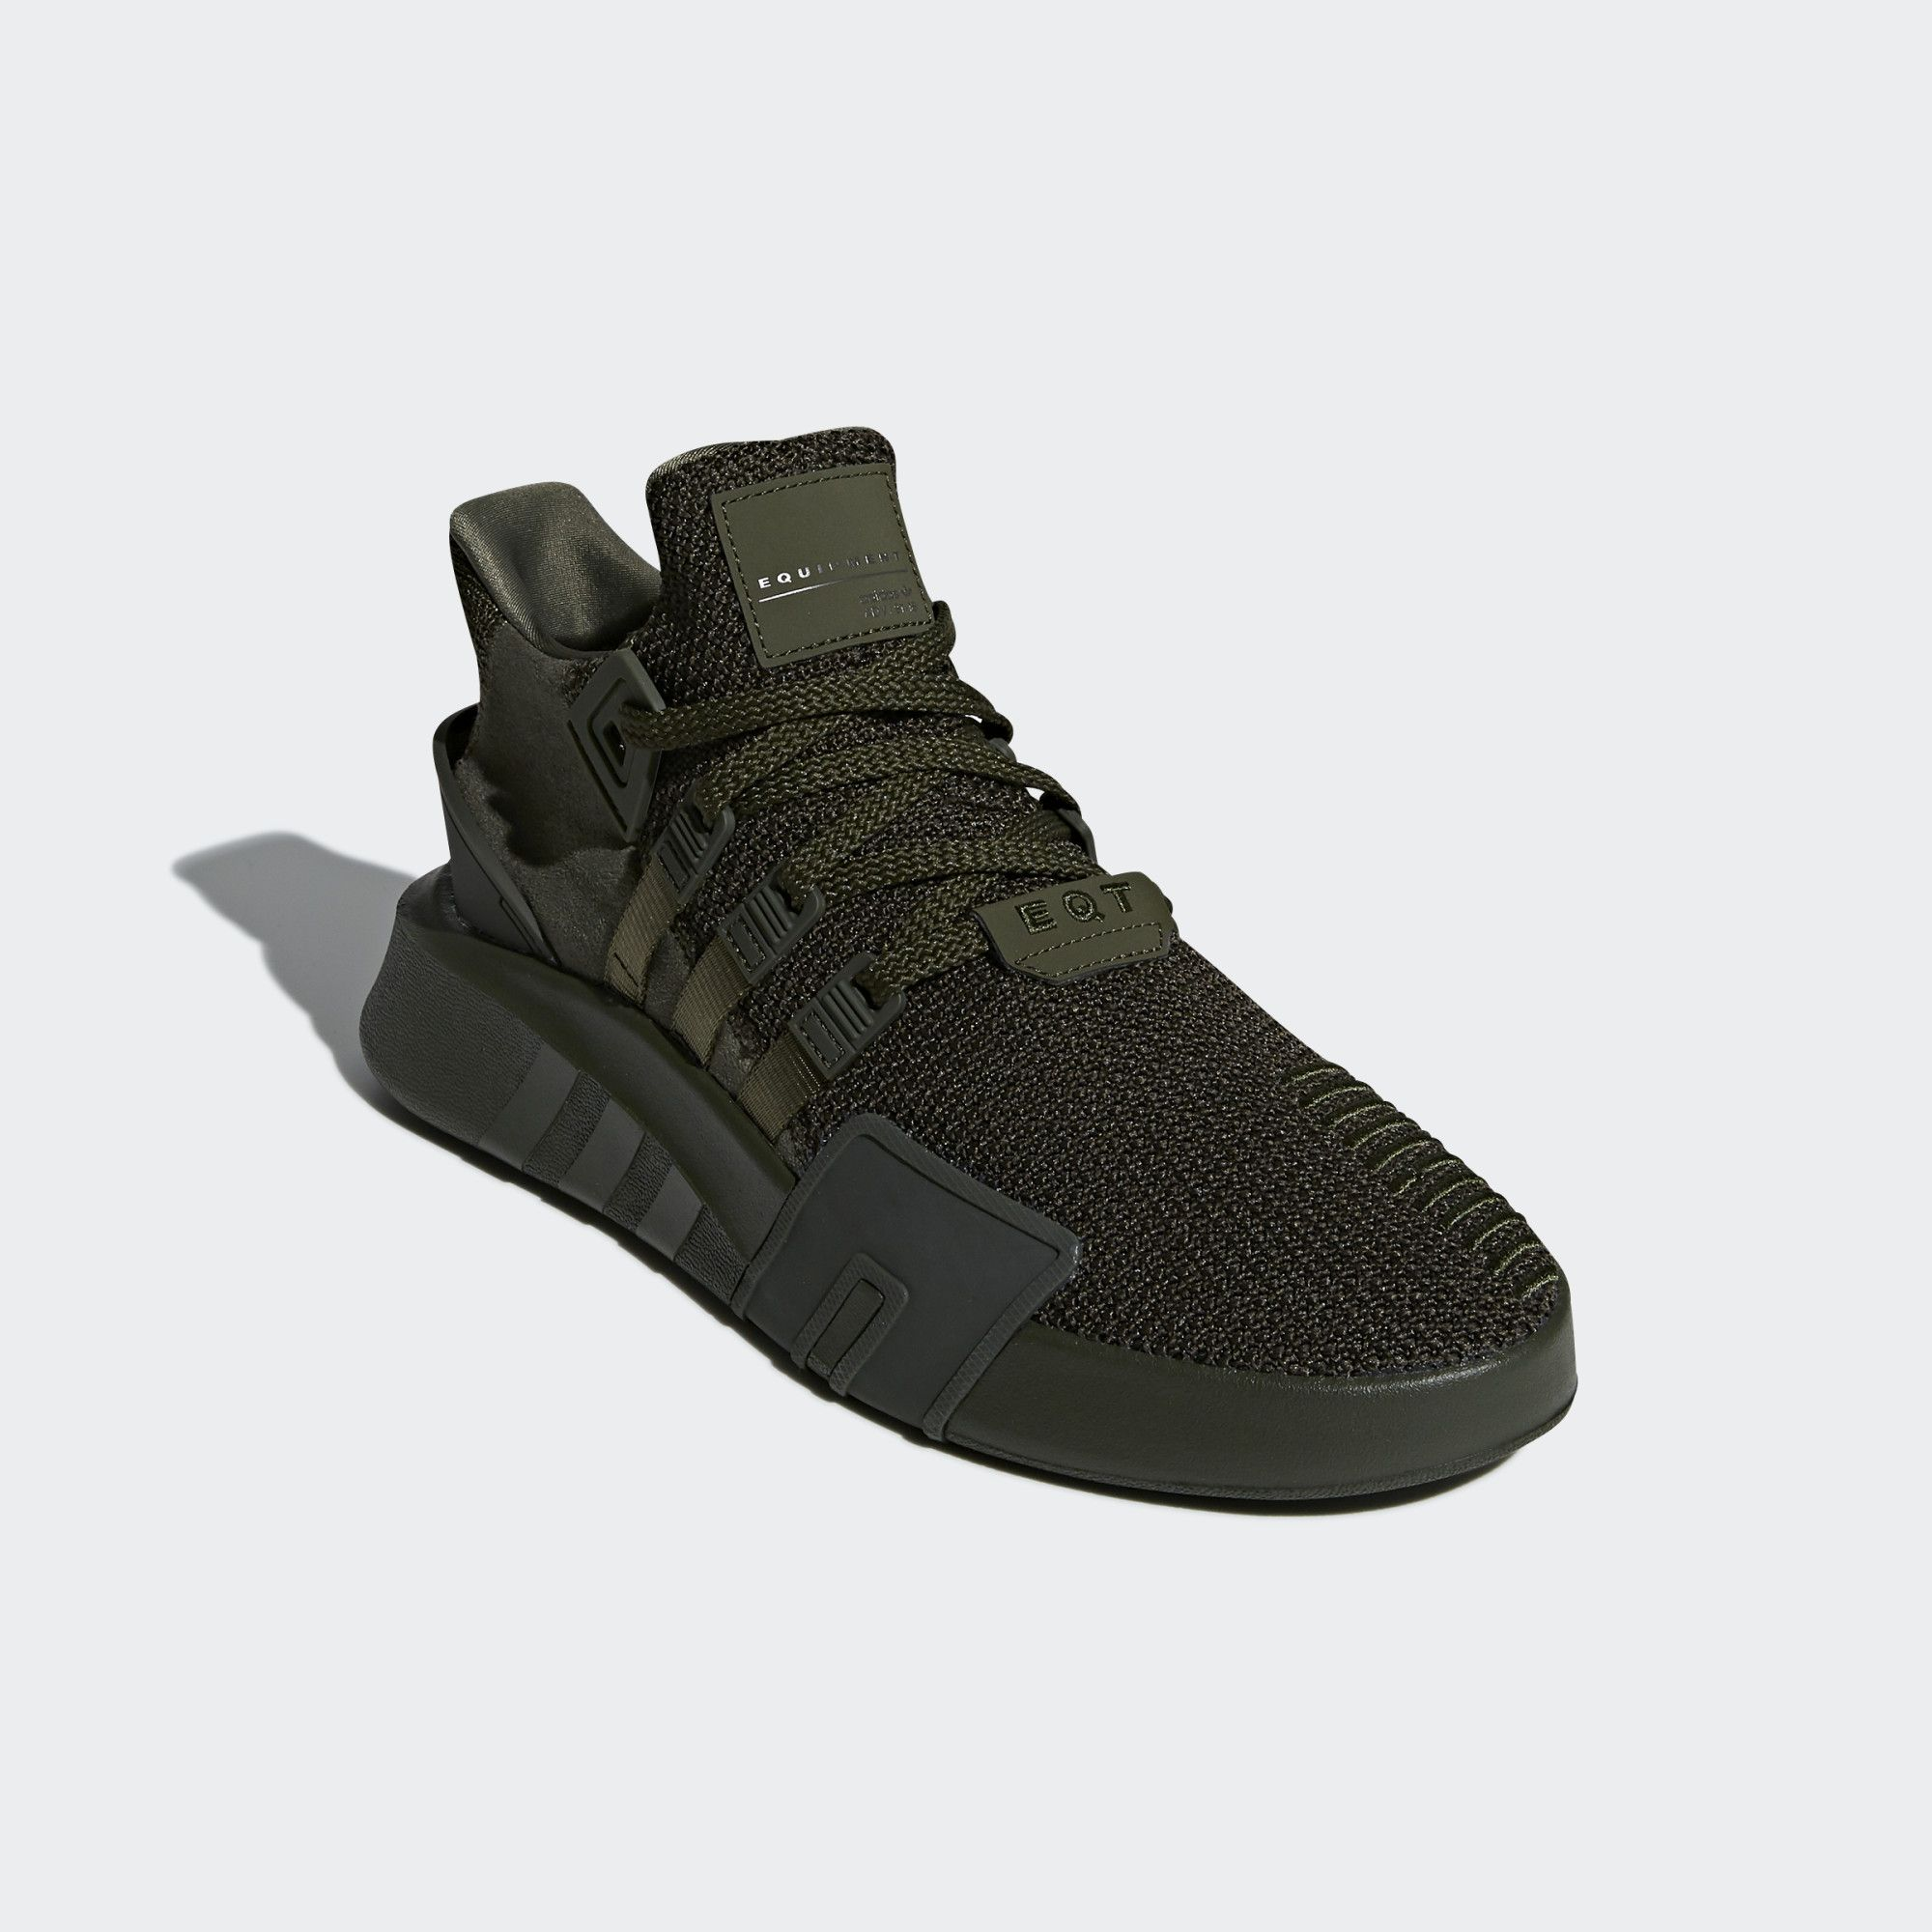 4c1a19dbdf adidas EQT Bask ADV Shoes - Green | adidas US | Sneaker | Shoes ...